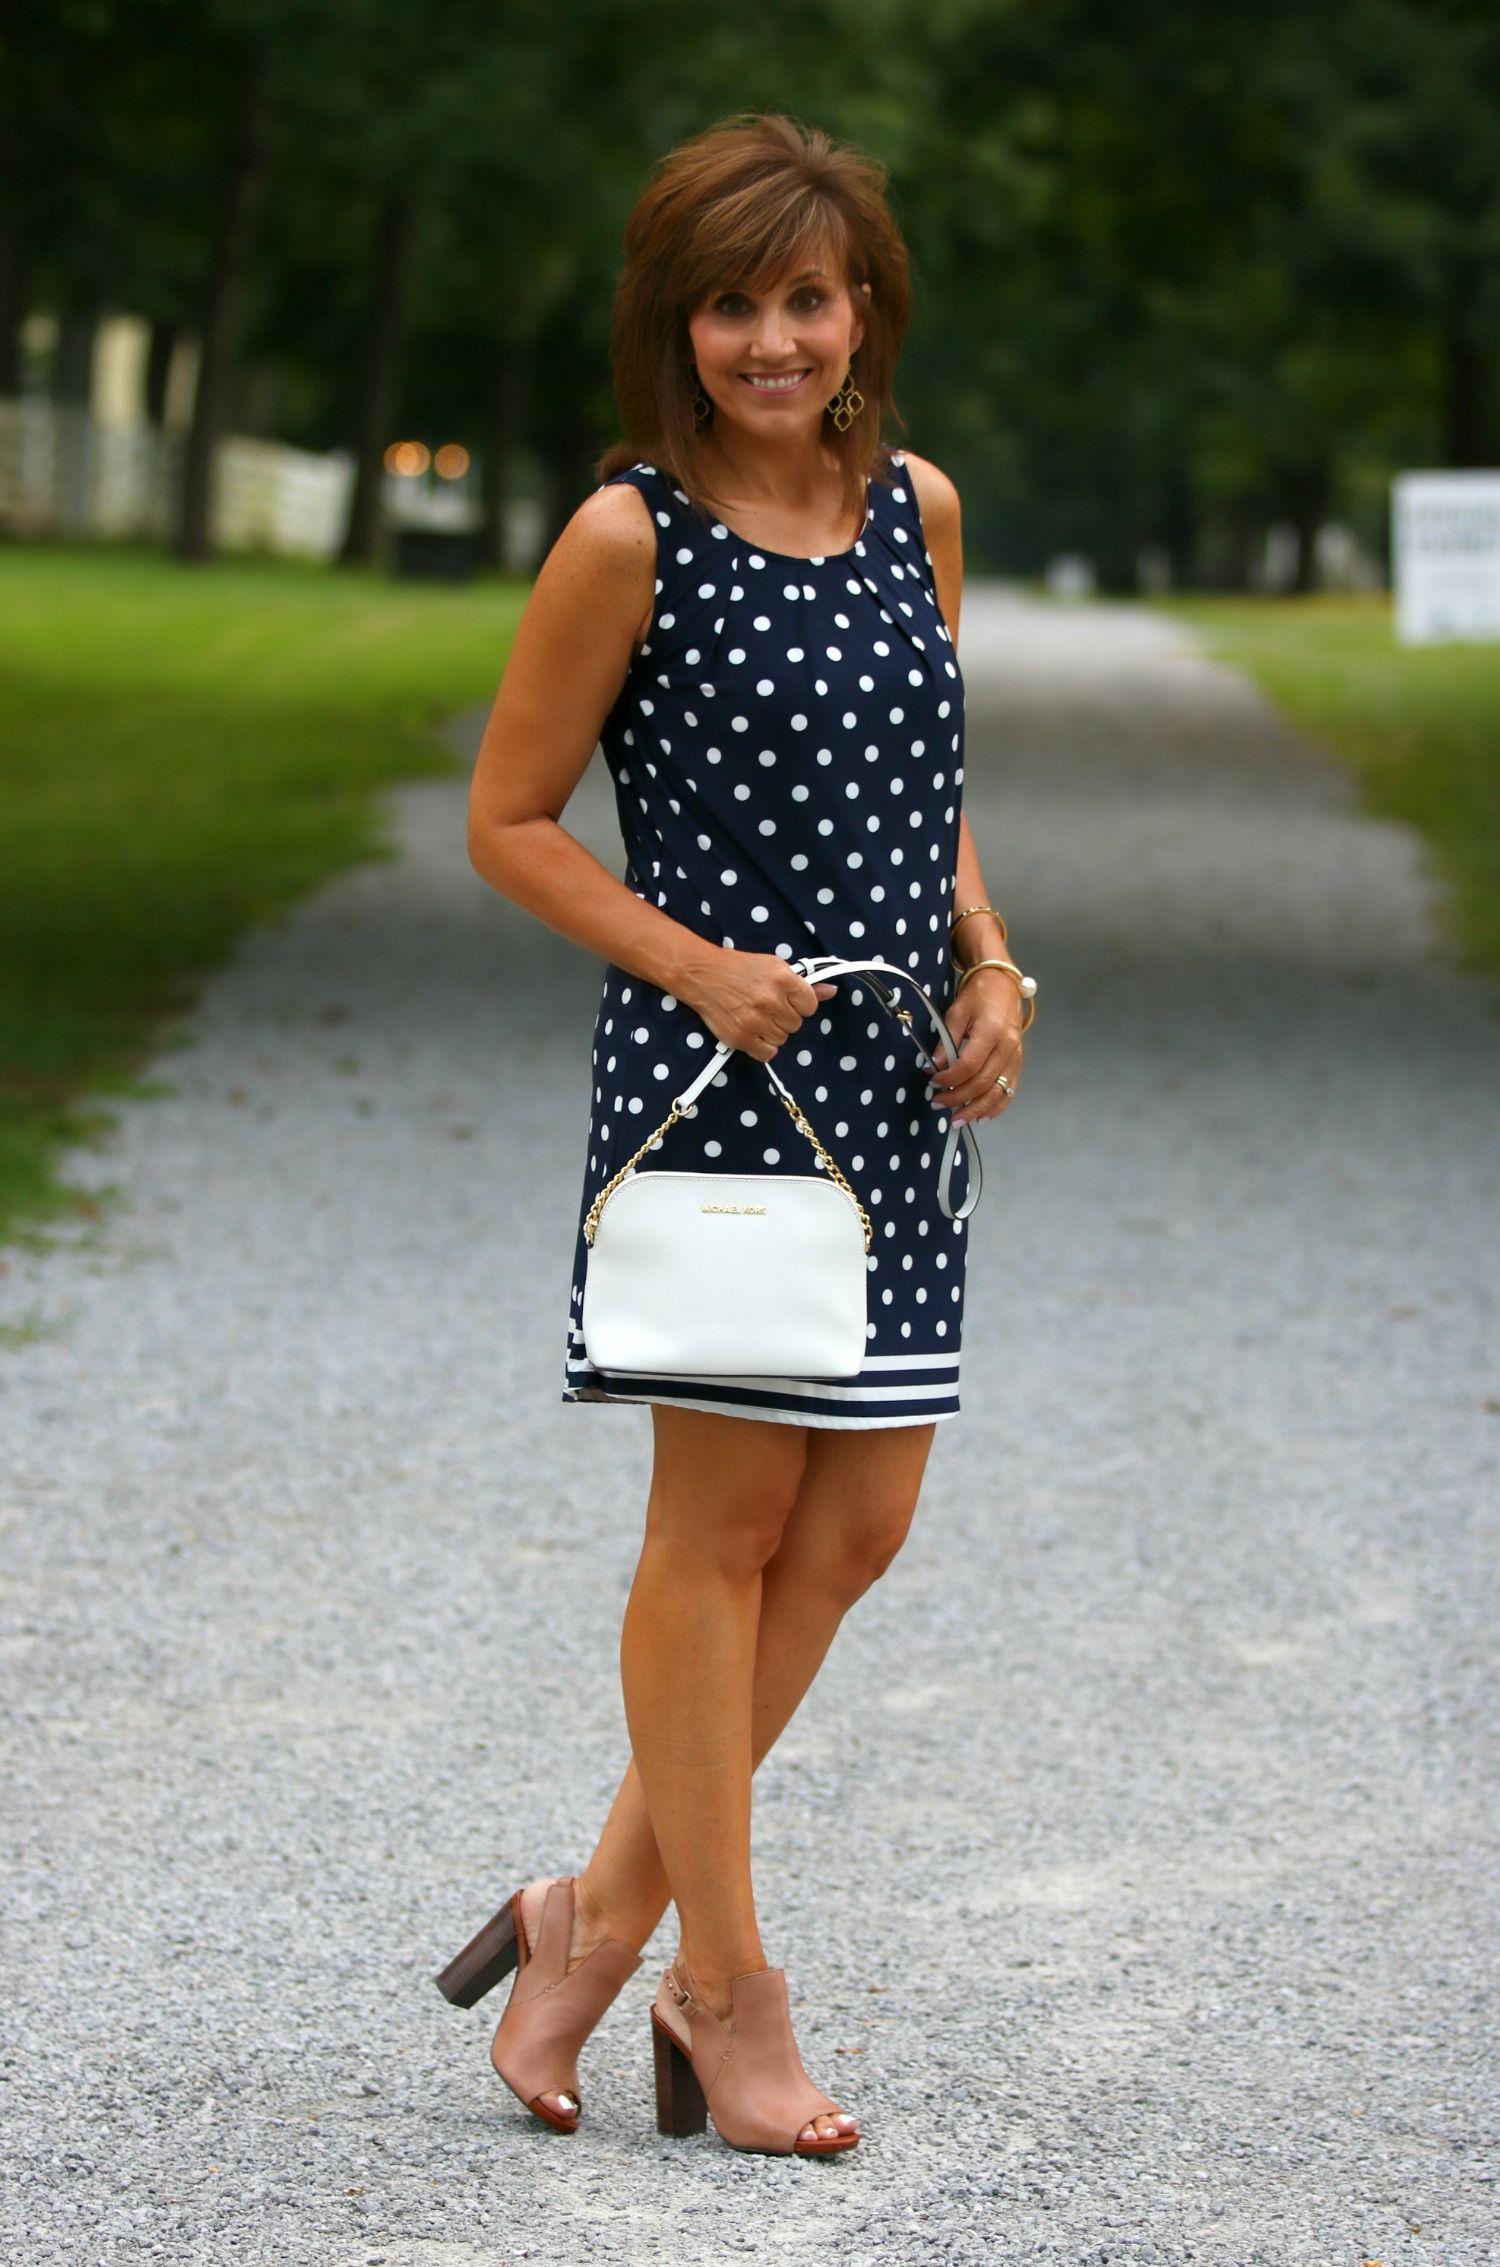 Polka Dot Dress-Summer Fashion | SPRING STYLE | Summer ...